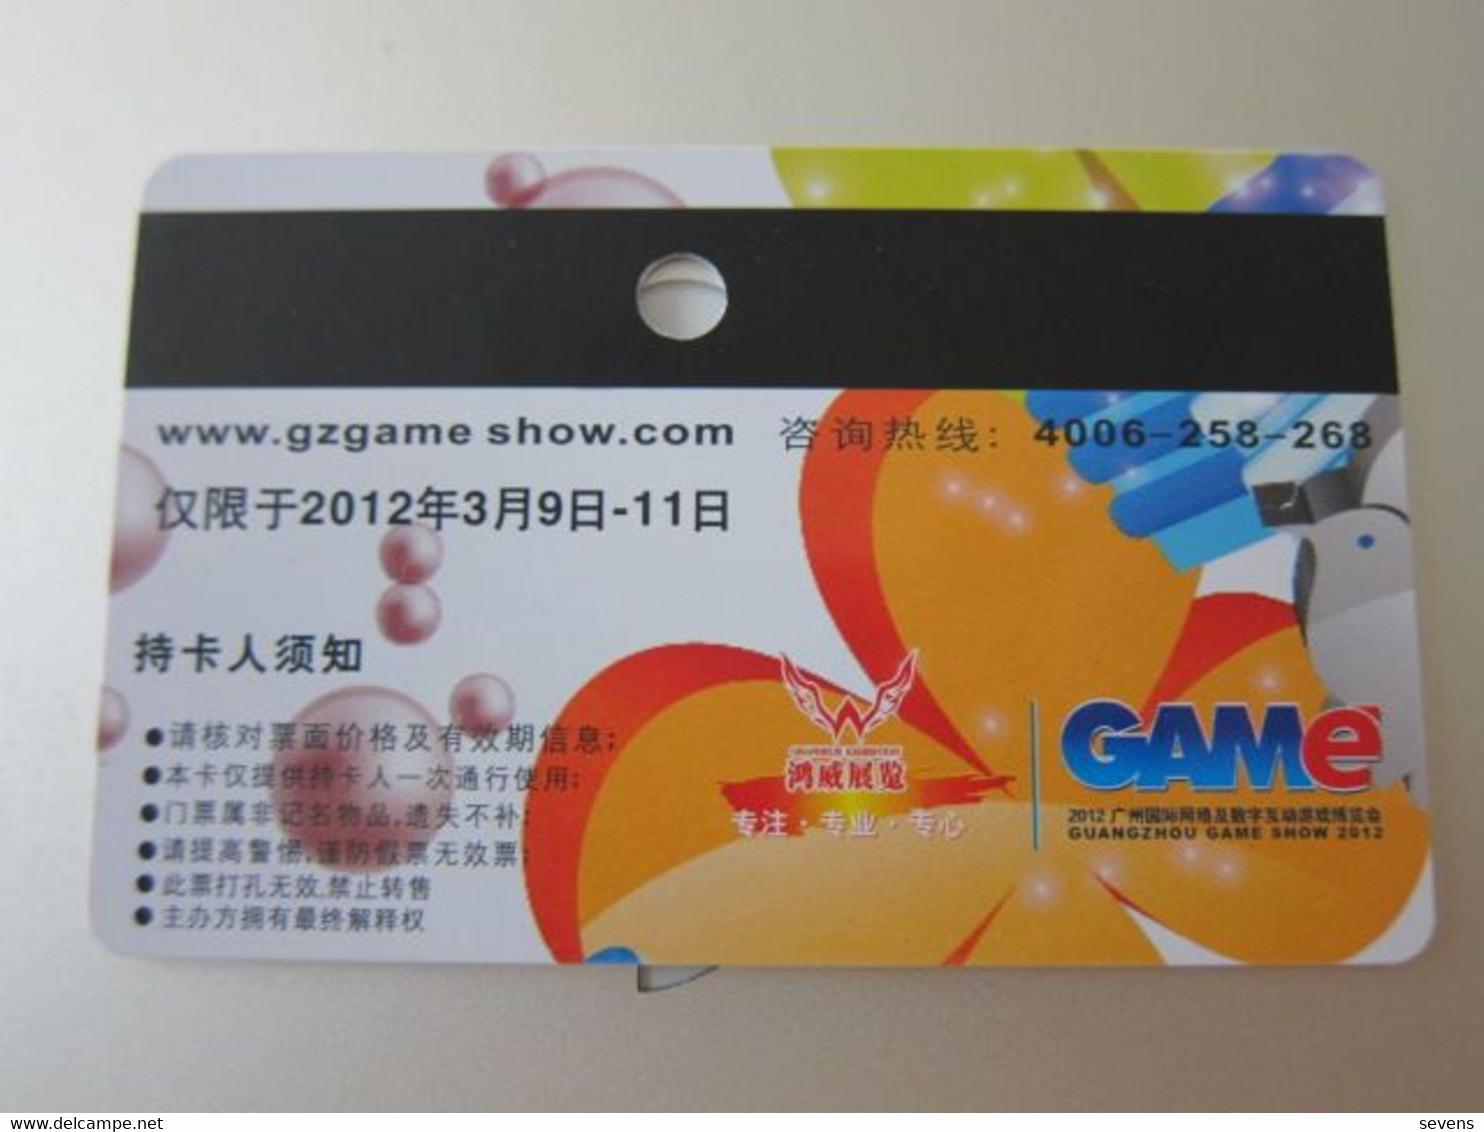 Guangzhou Game Show 2012 Entry Card - Unclassified